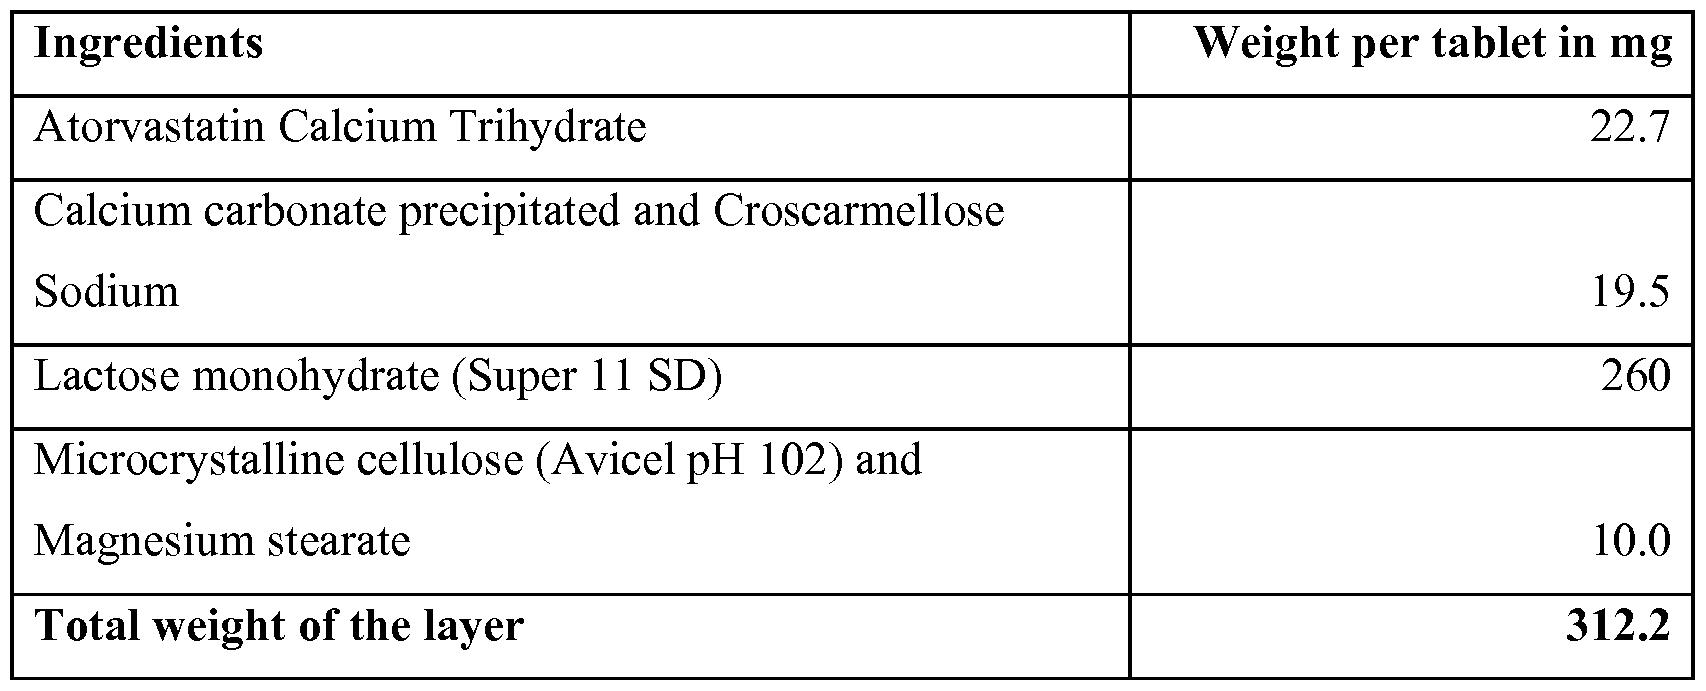 Atorvastatin 10 mg tabletten.doc - Figure Imgf000009_0001